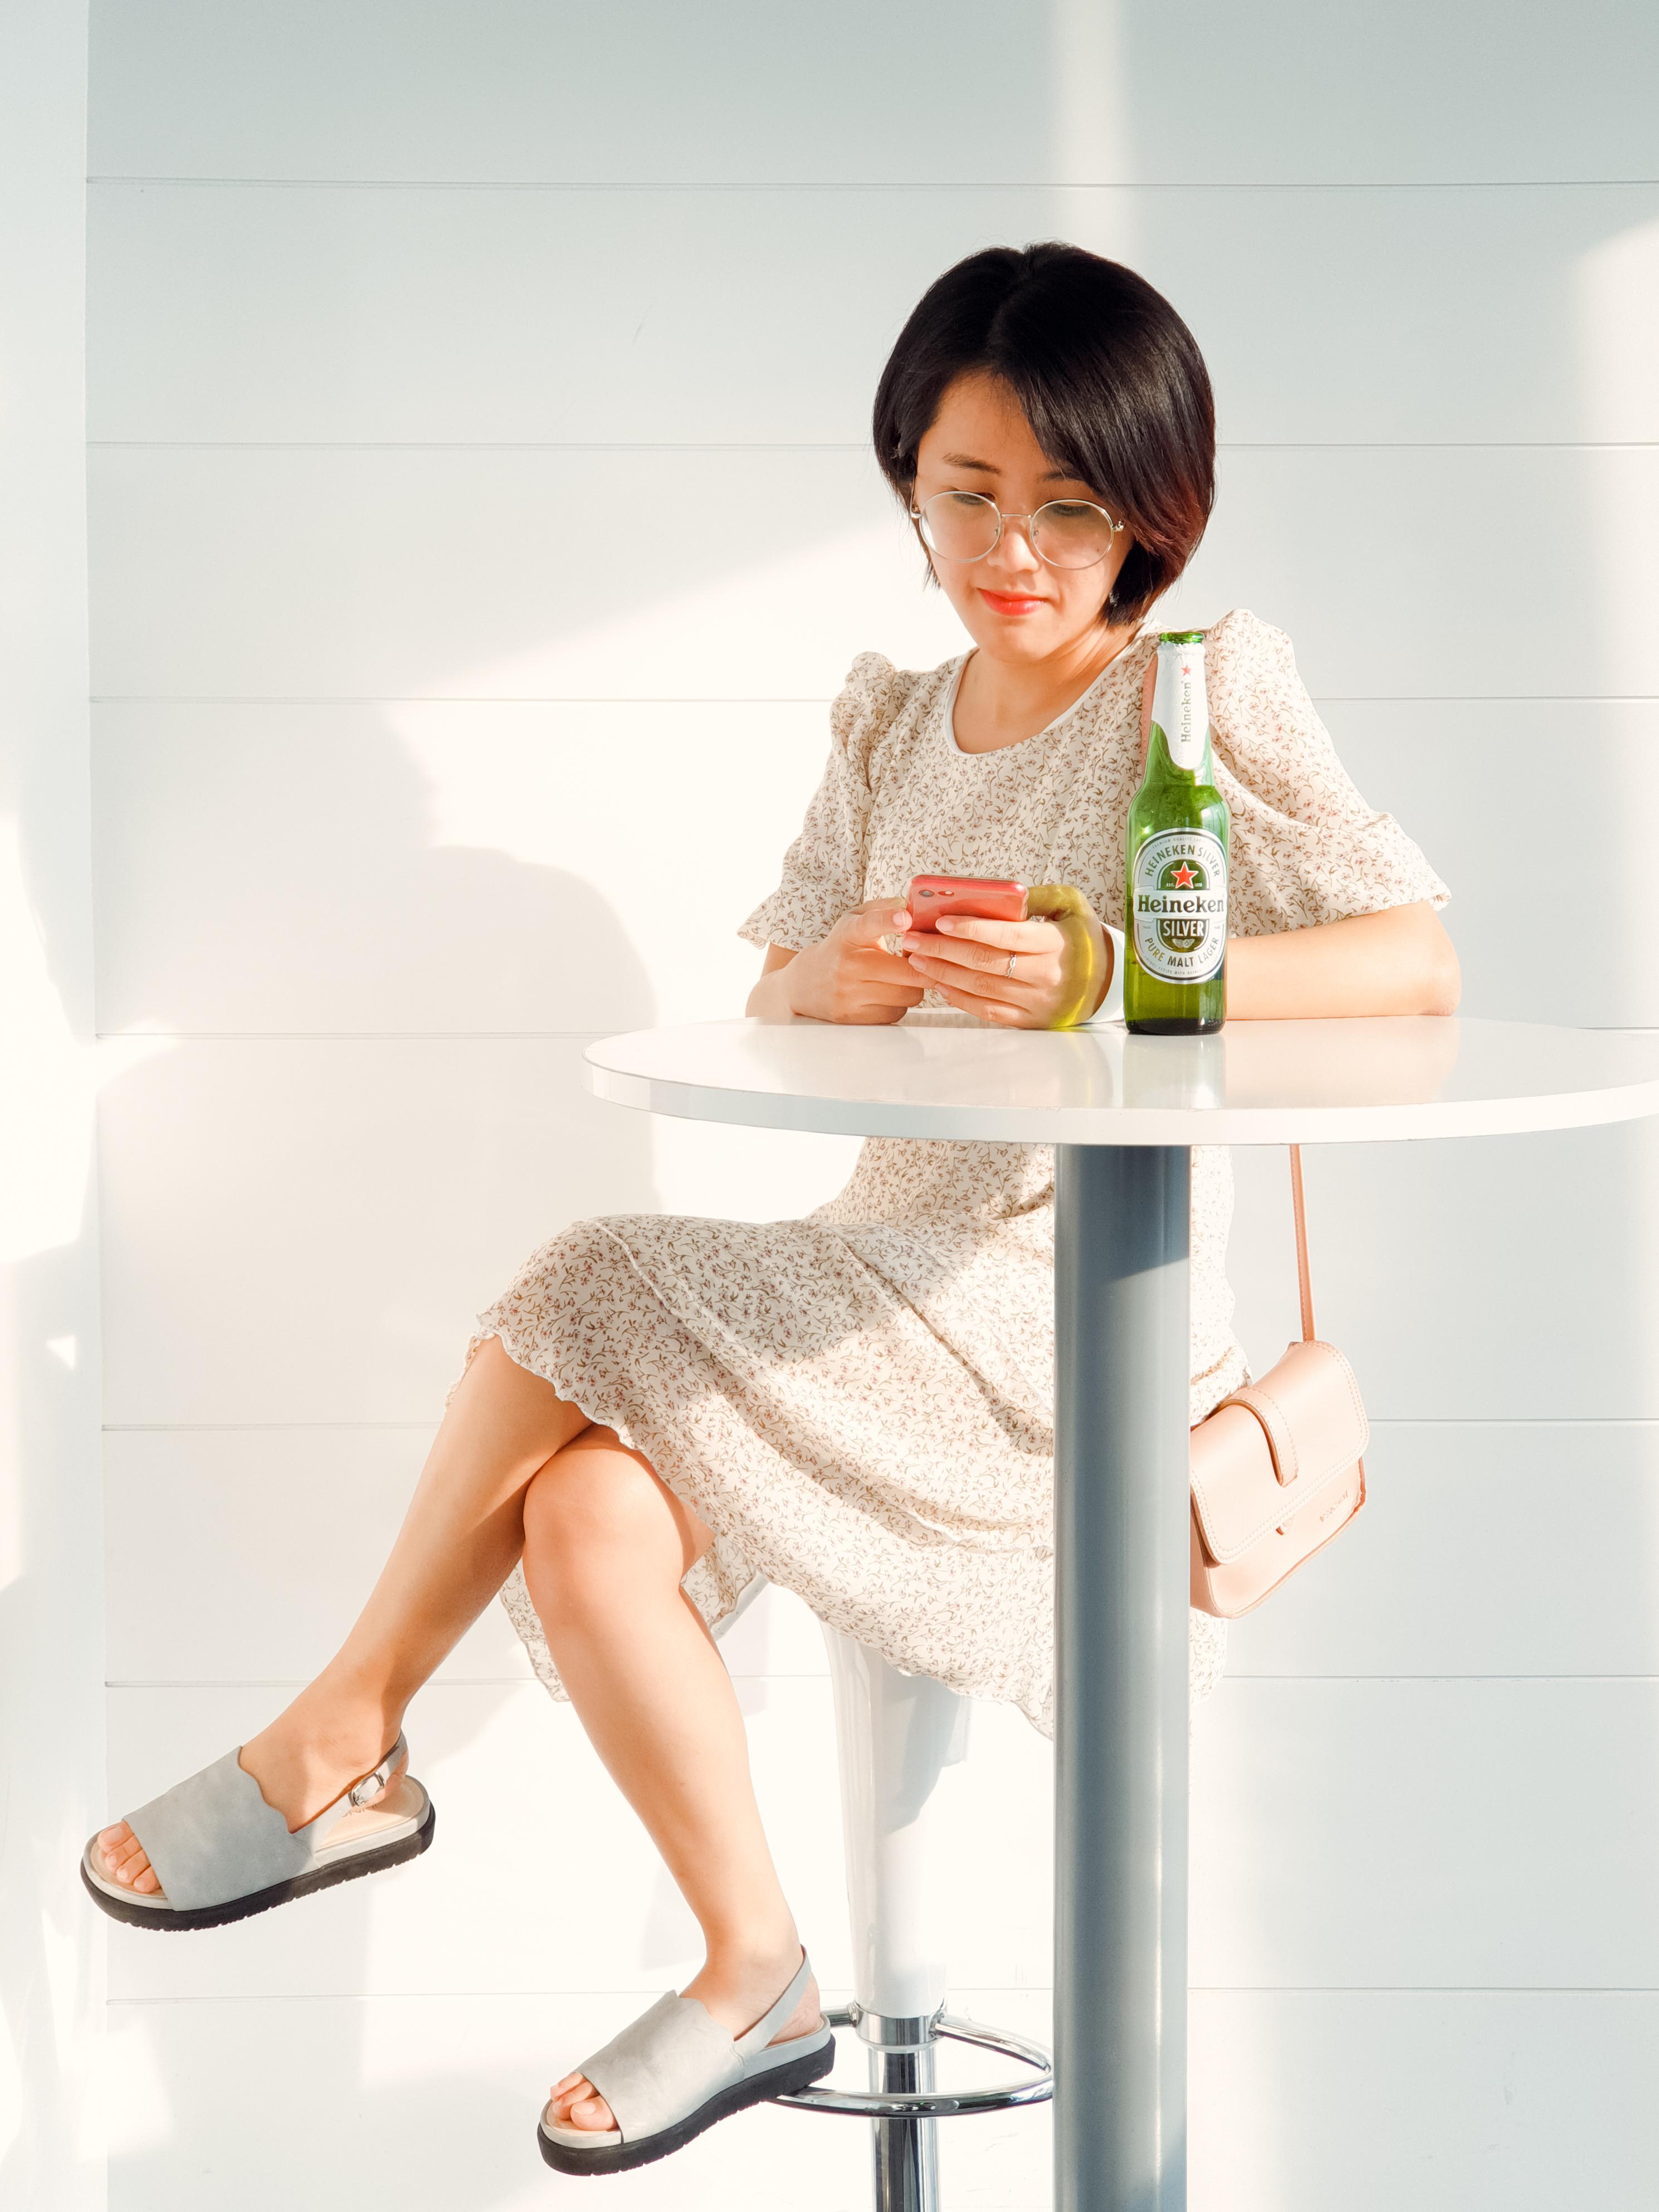 Woman Sitting on Bar Stool